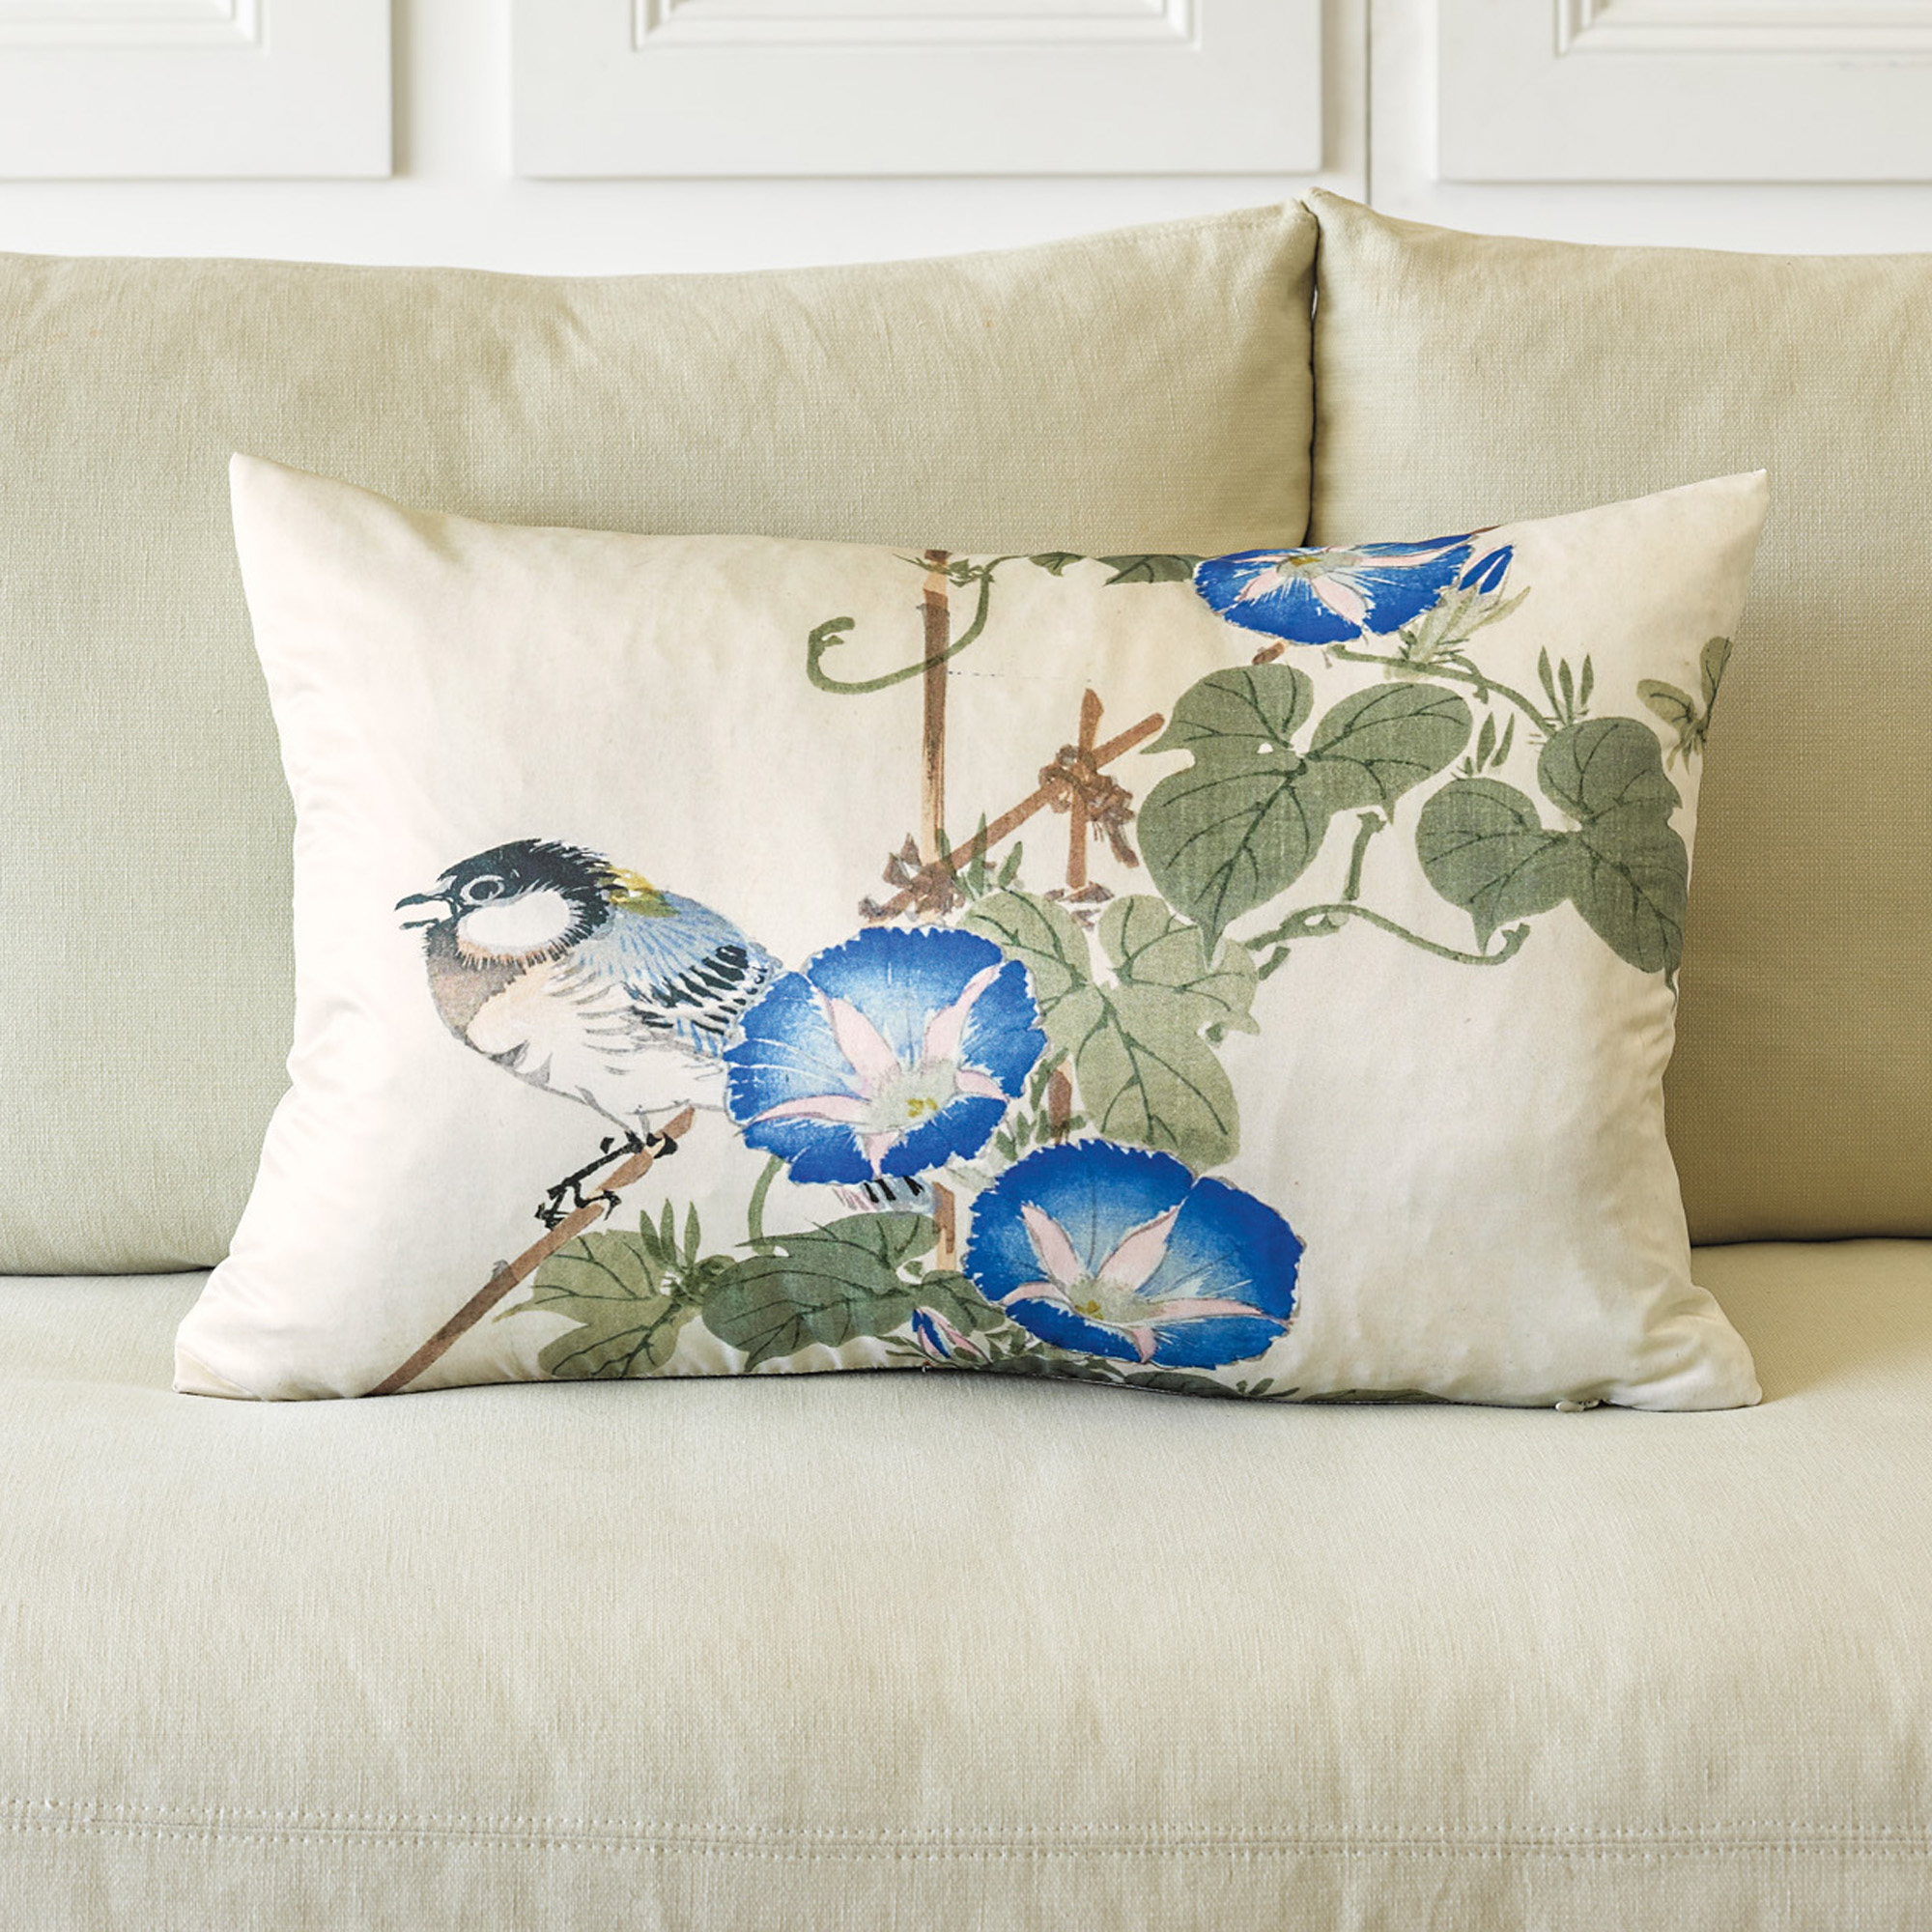 Throw Pillows Home : Morning Glory Pillow Gump s